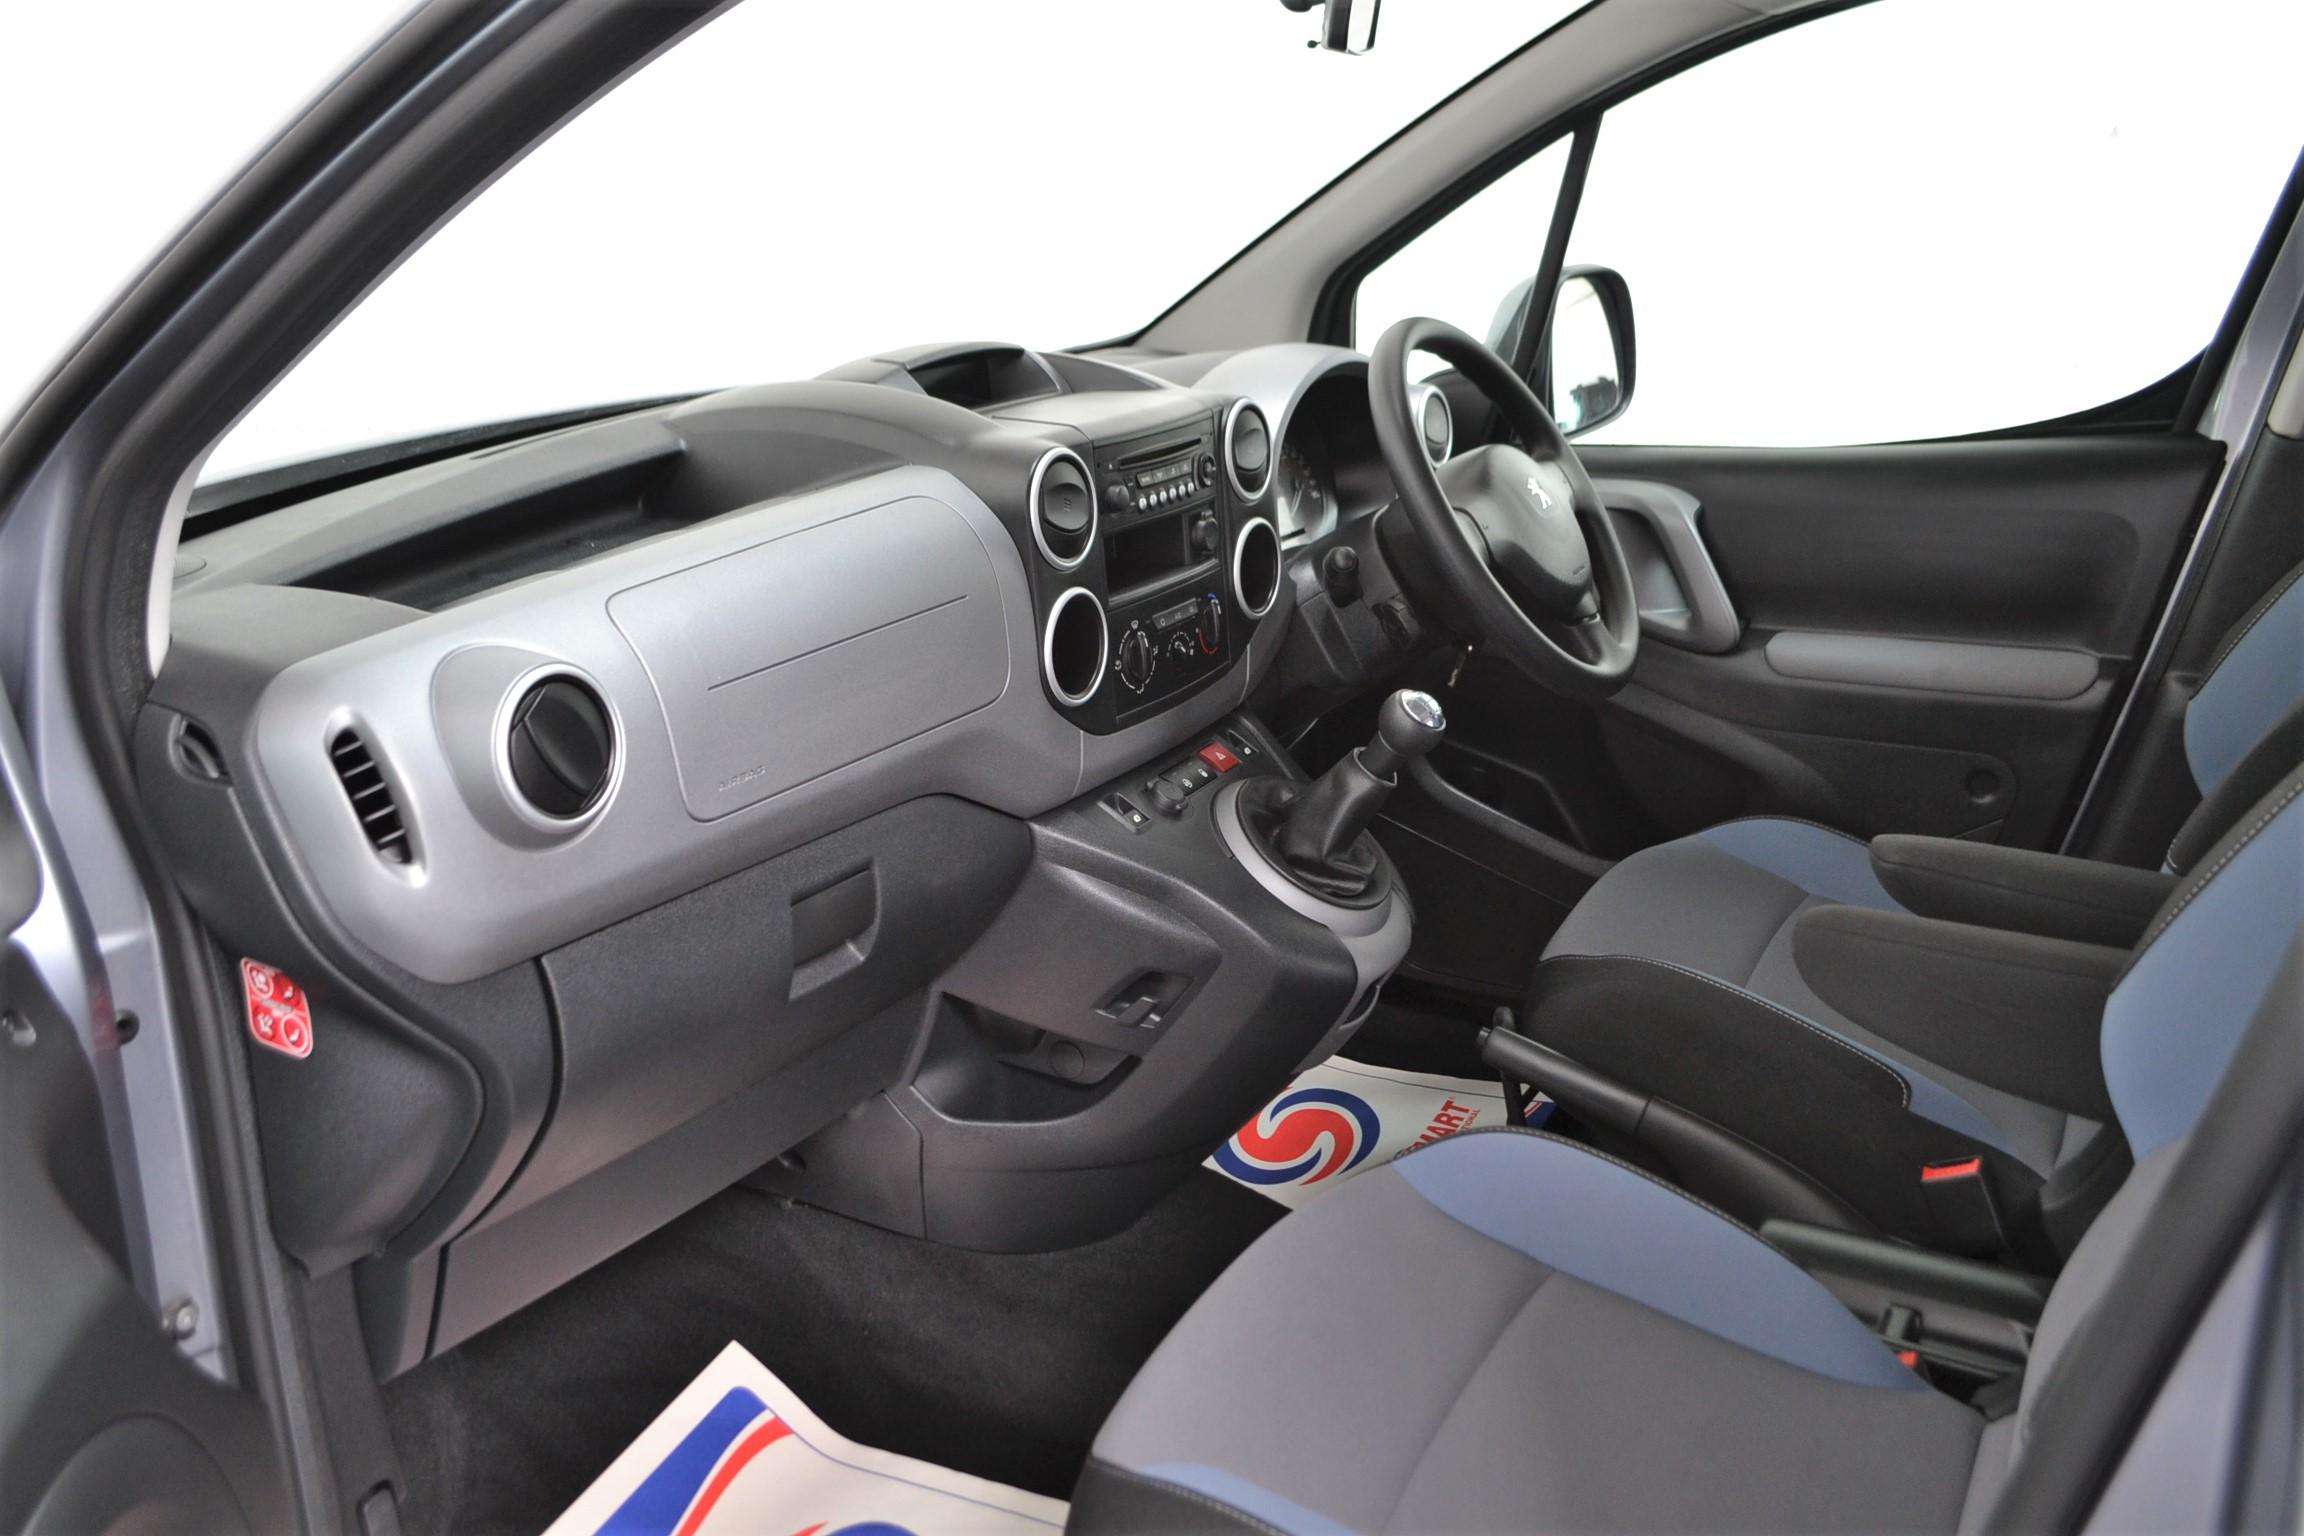 Used Wav Cars for Sale UK Citroen Berlingo WAV Car Peugeot Partner Petrol Wheelchair Accessible Vehicles Buy Sell Bristol Somerset Devon Dorset 9